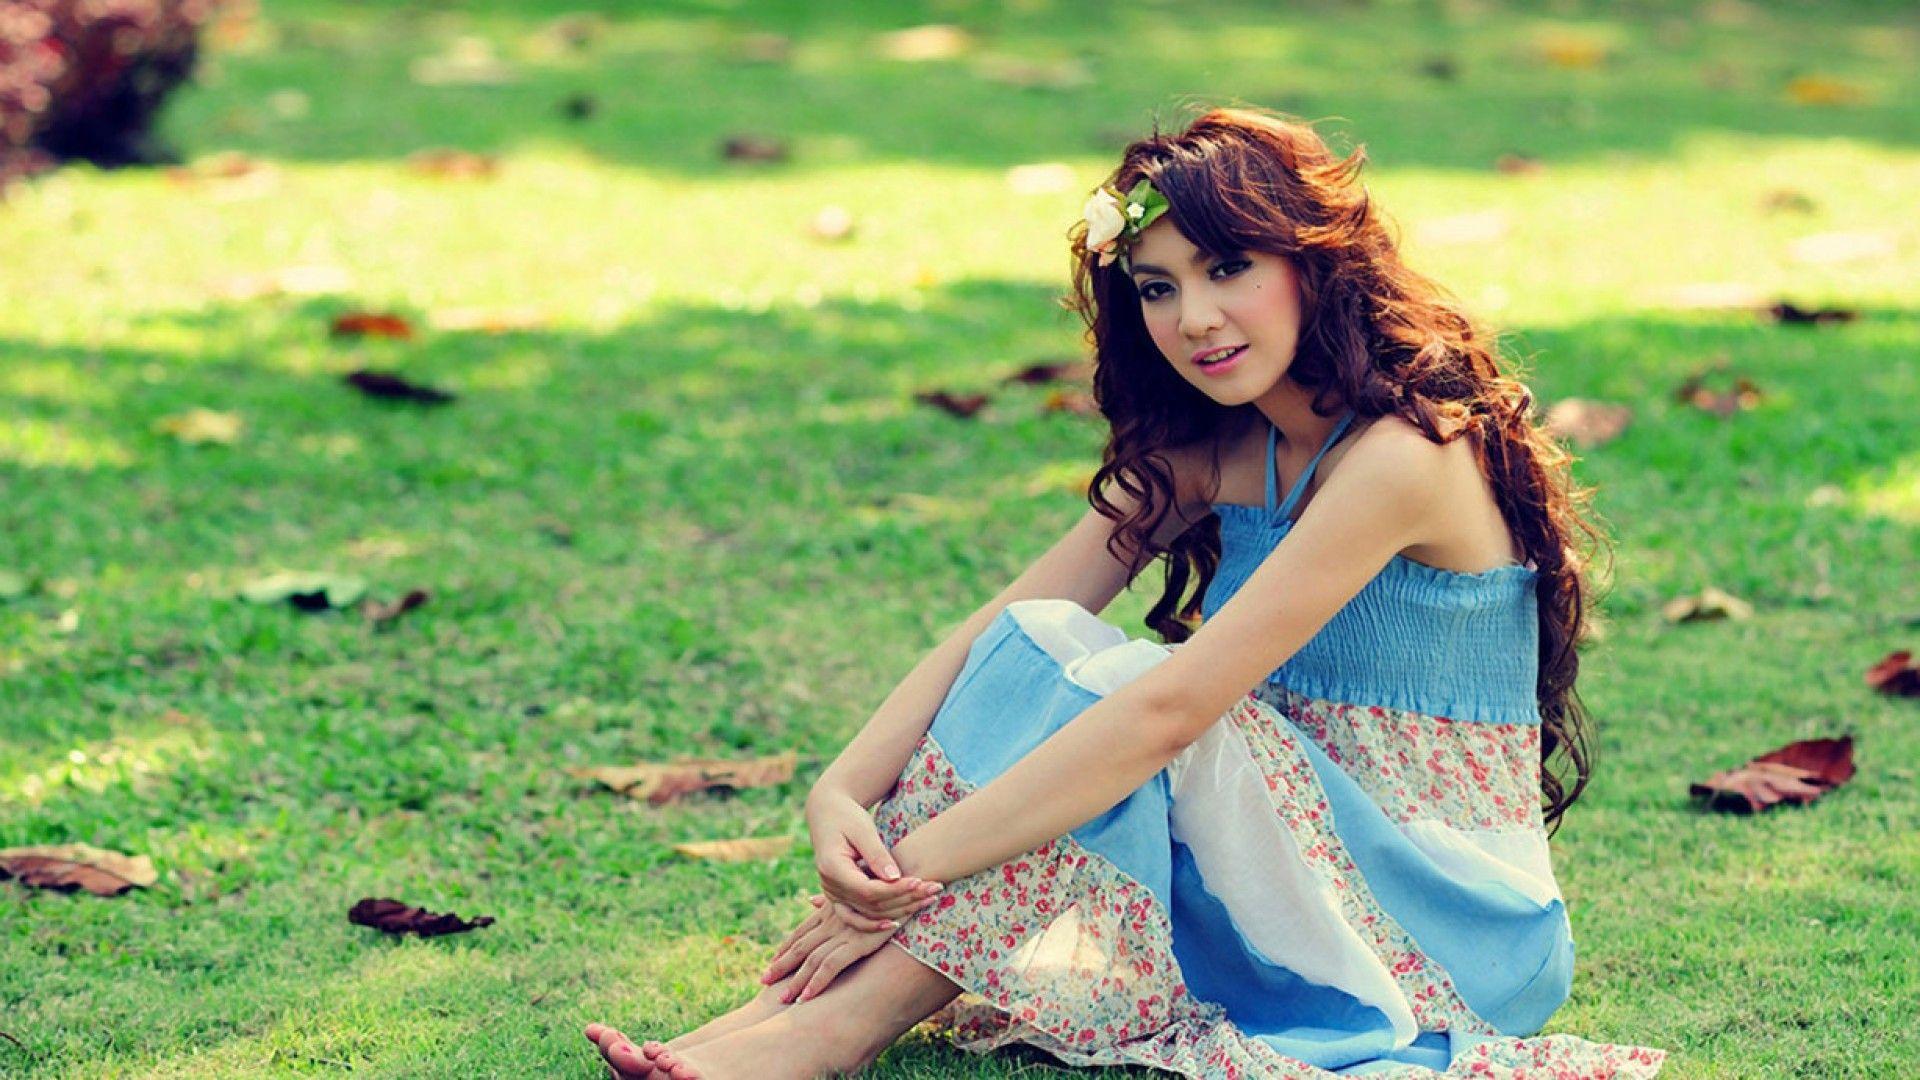 Download Beautiful Girls Wallpapers | wallpapers | Beautiful girl wallpaper, Beautiful girl hd ...